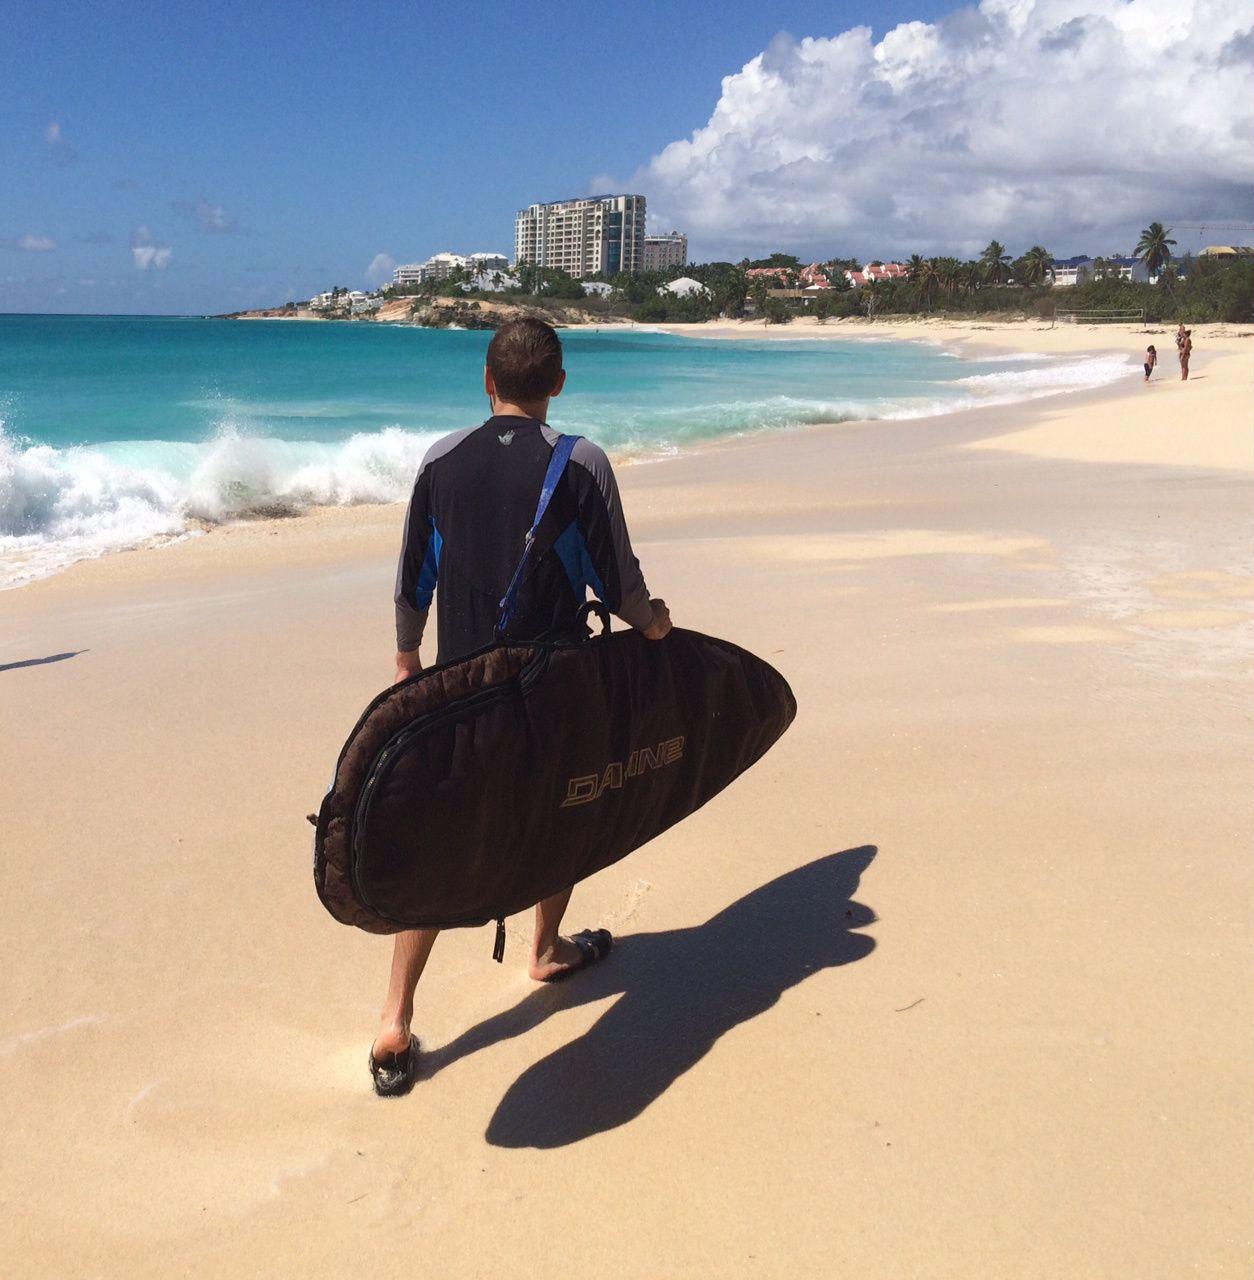 2016 St. Maarten/ St. Martin Travel Guide Travel